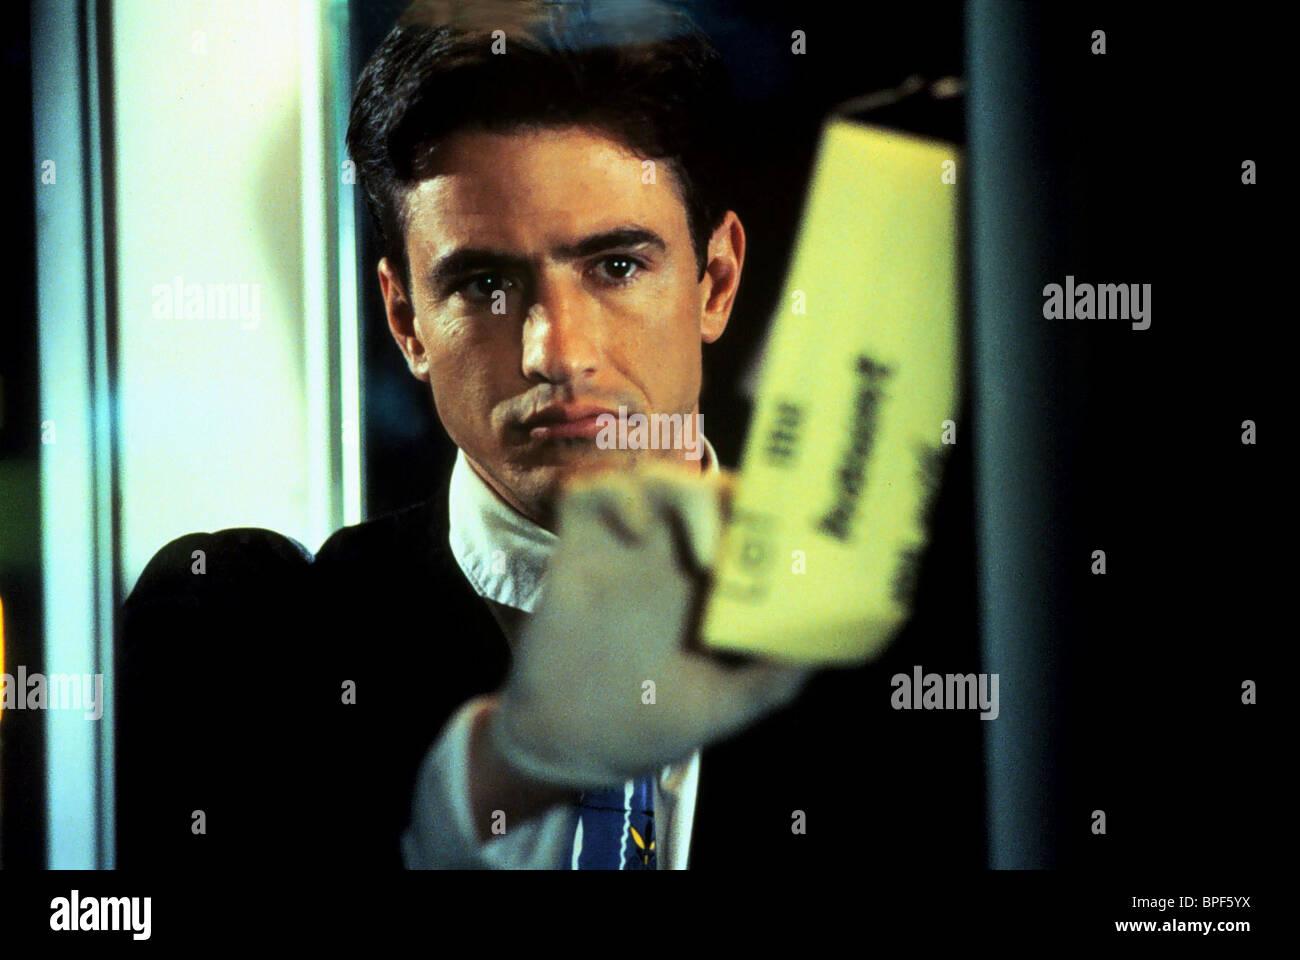 DERMOT MULRONEY COPYCAT (1995) - Stock Image